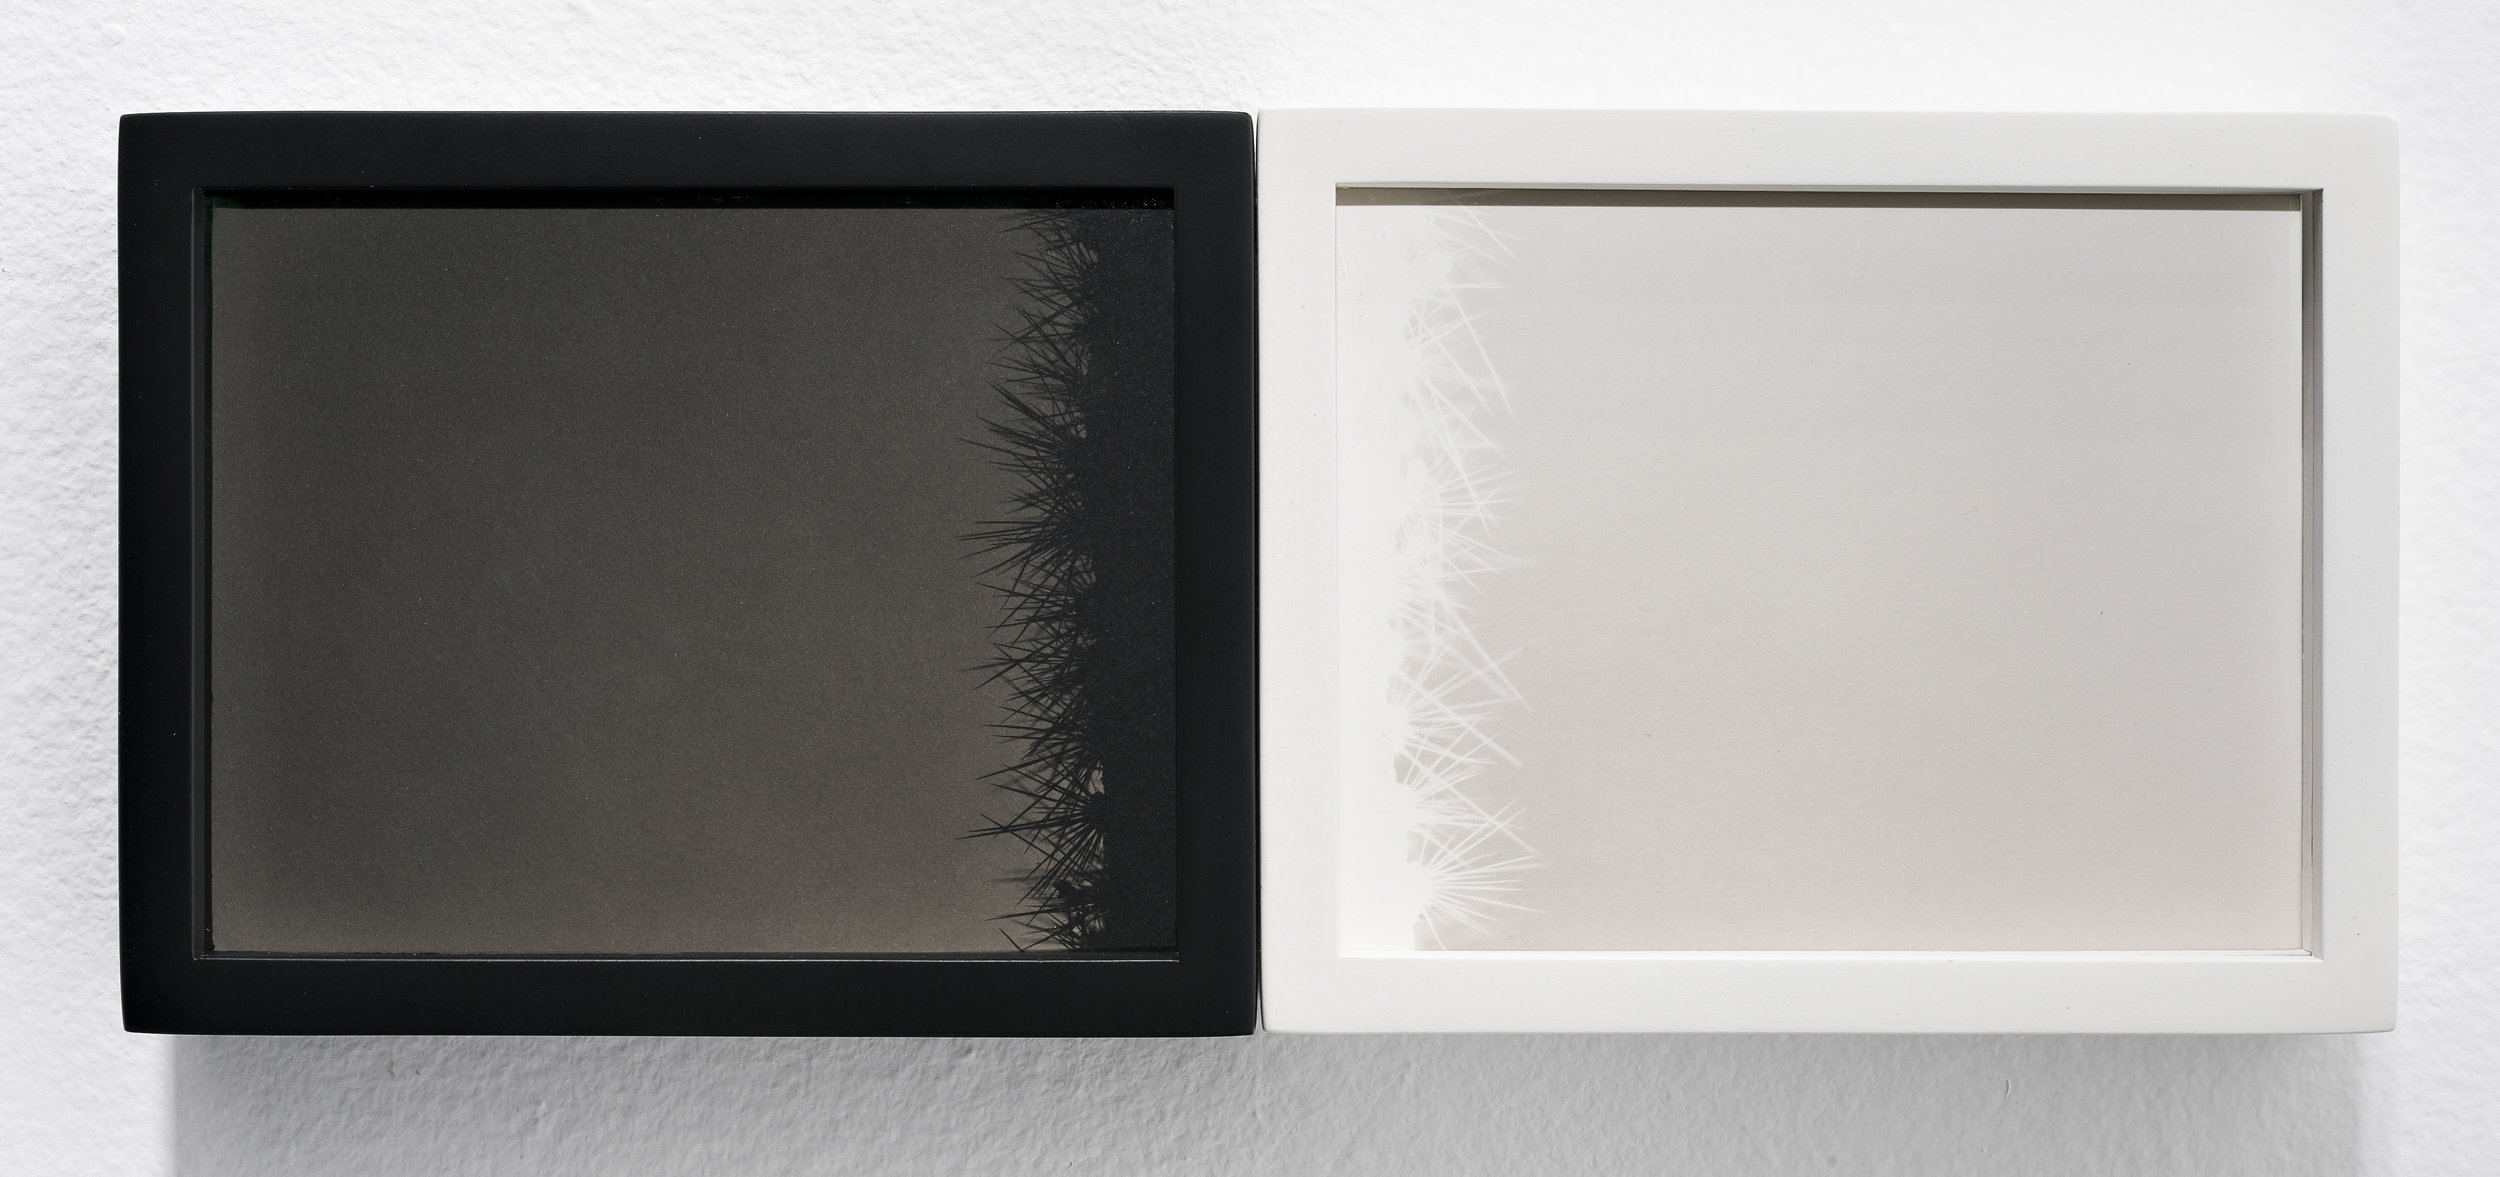 SCOTT B. DAVIS Saguaro, U.S./Mexico Border, 2018 Unique paper negative palladium prints, diptych 4 x 10 inches; frame: 4.5 x 10.5 inches